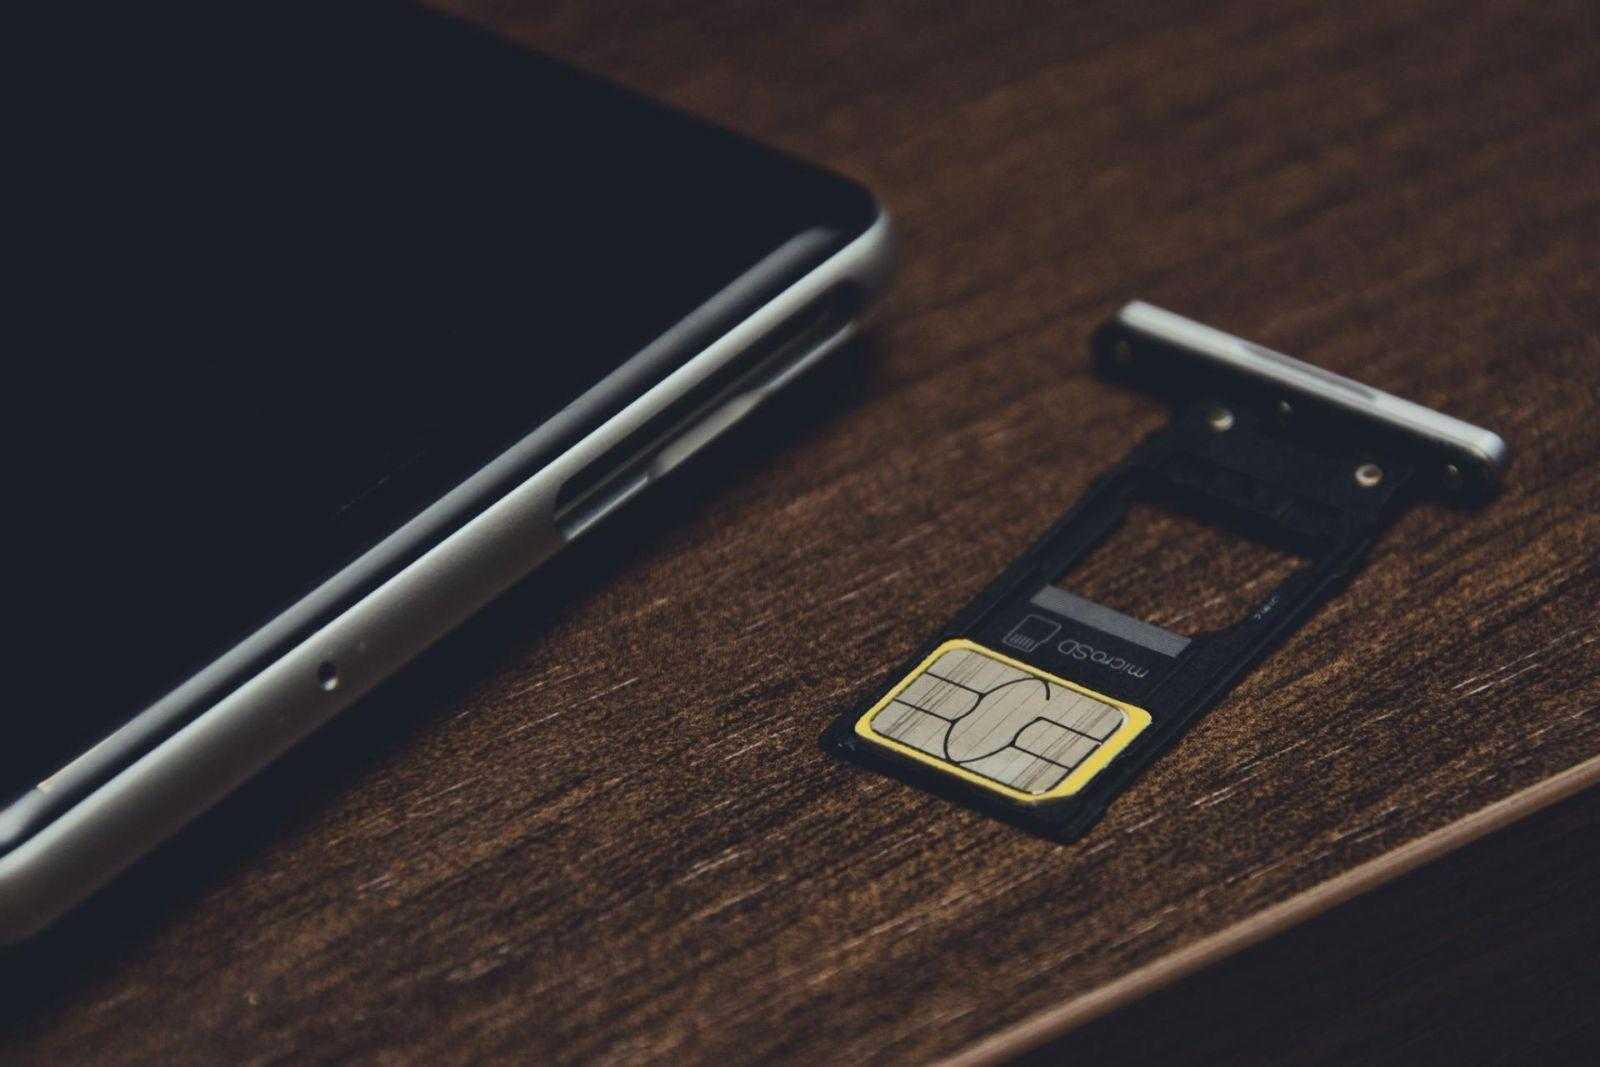 Хочешь — вставляй вторую SIM, хочешь — microSD, на выбор.